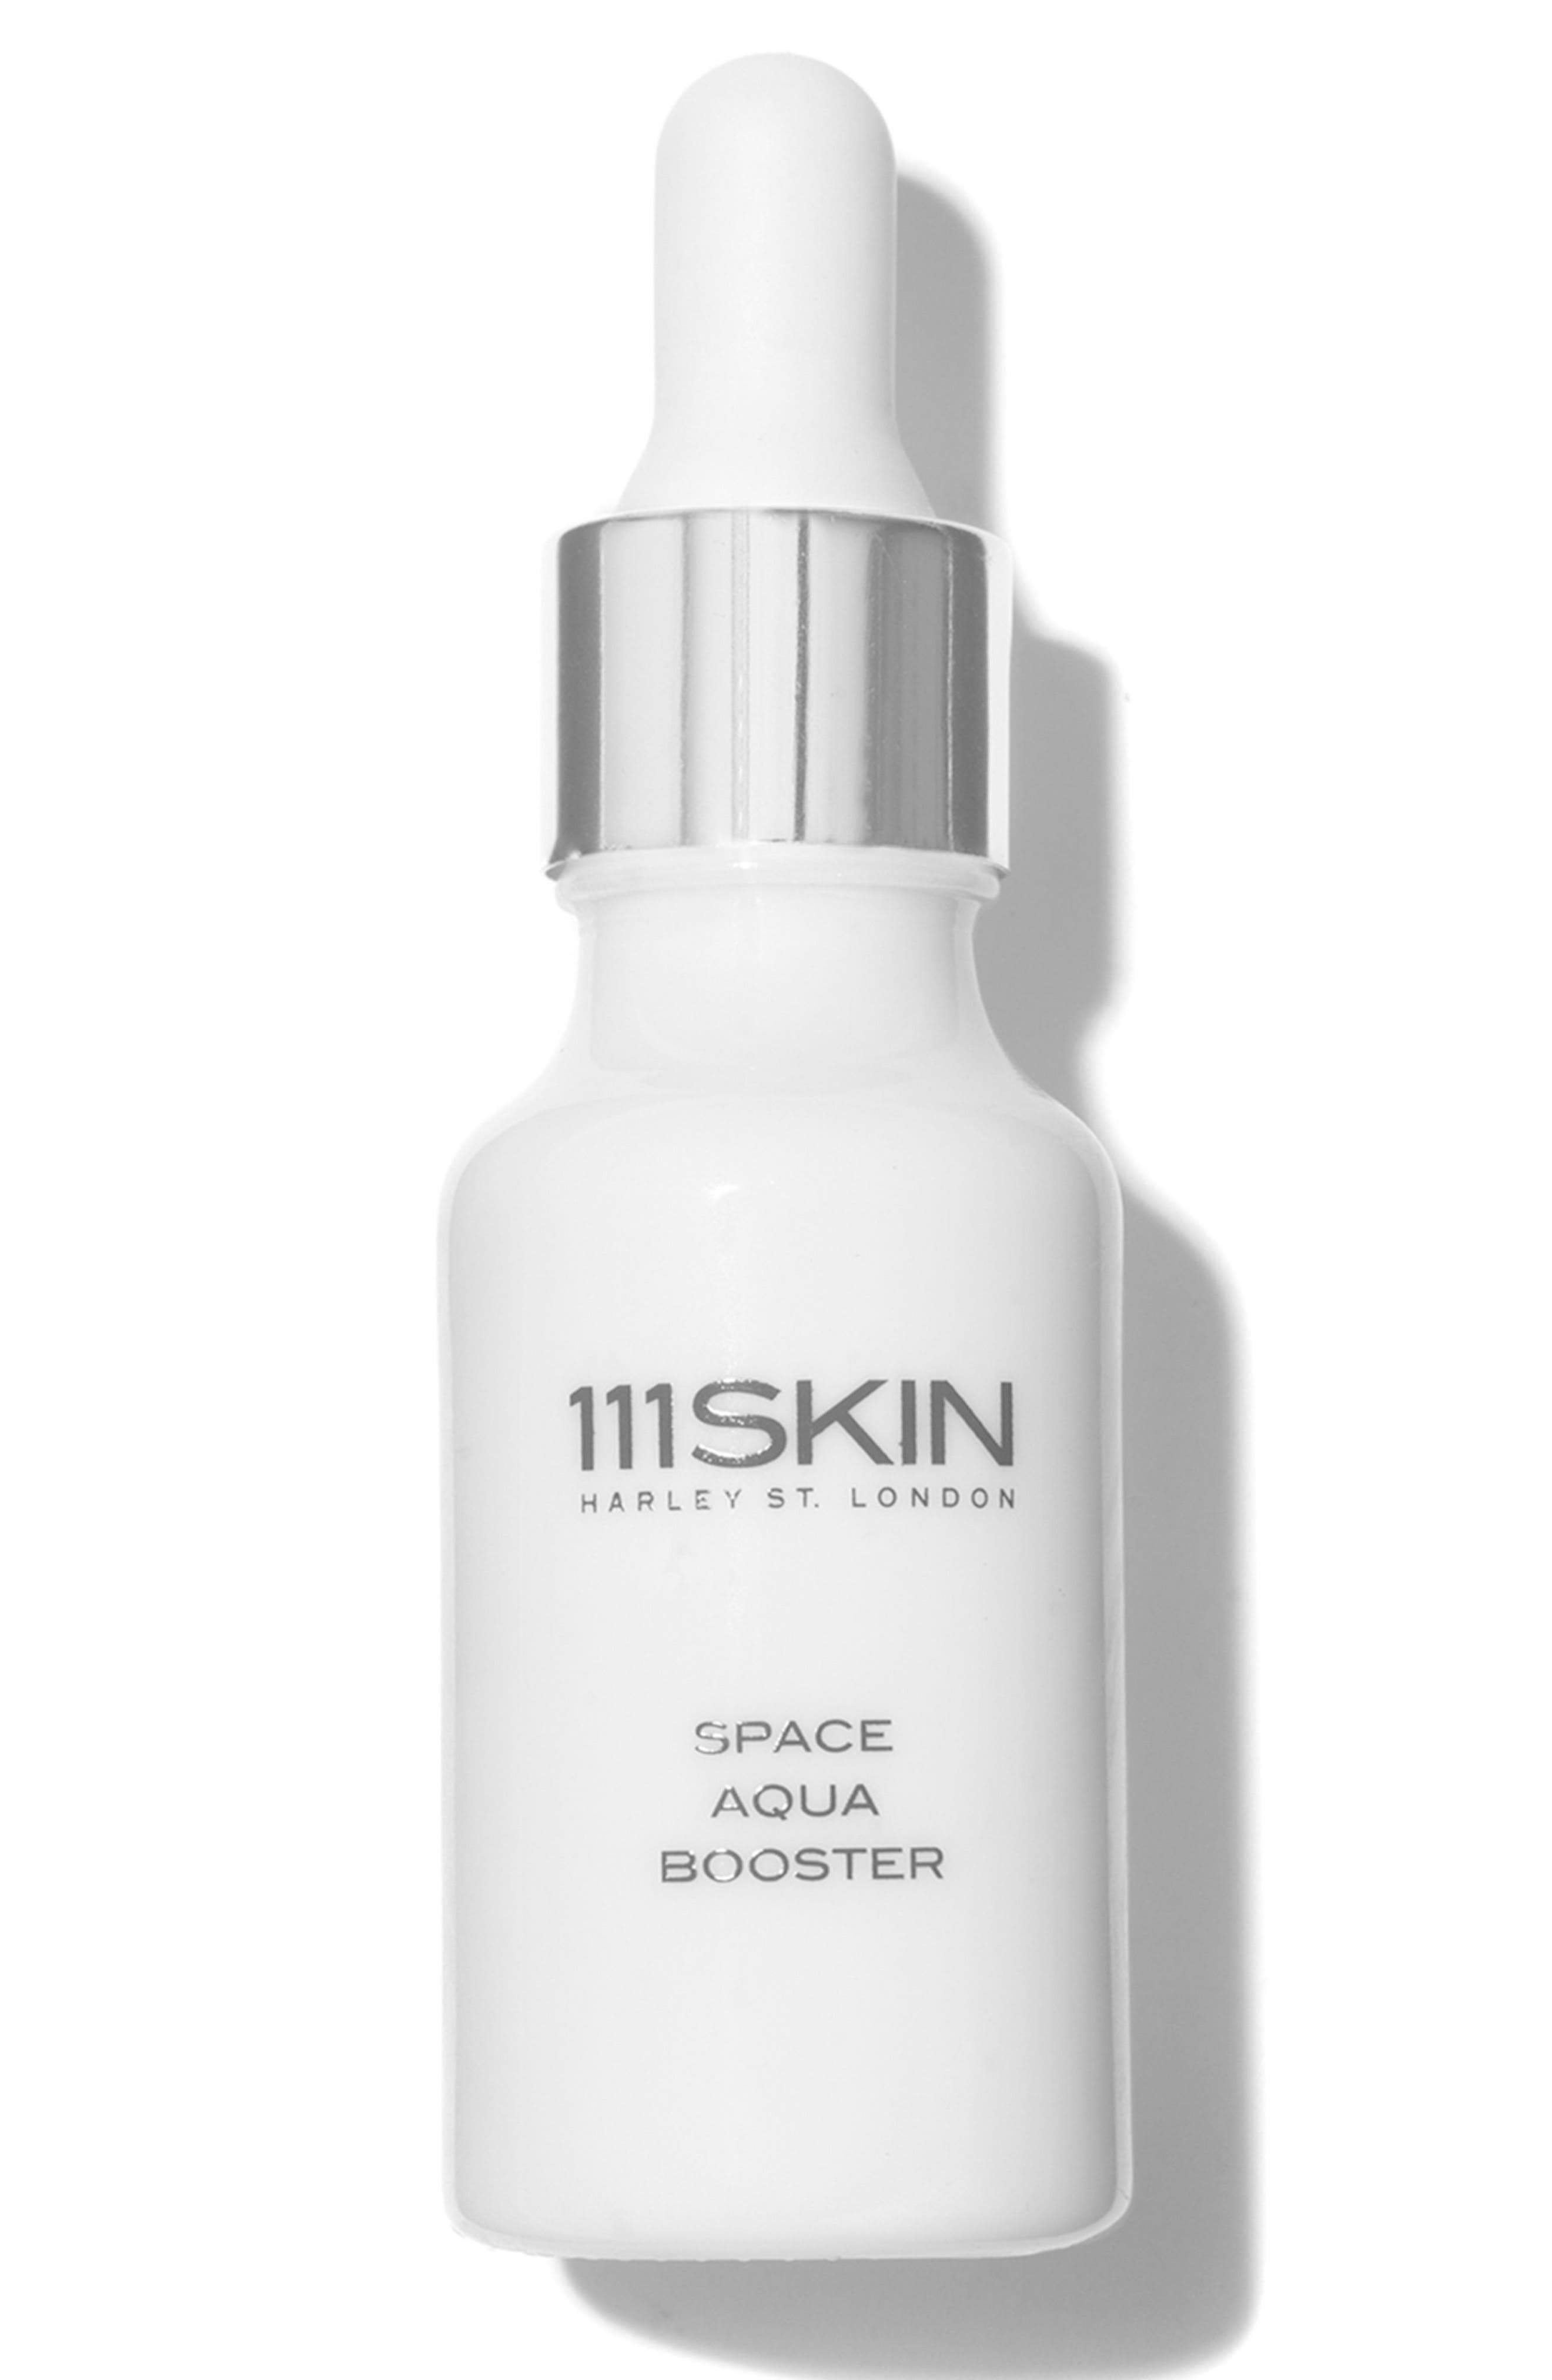 SPACE.NK.apothecary 111SKIN Space Aqua Booster,                             Main thumbnail 1, color,                             No Color